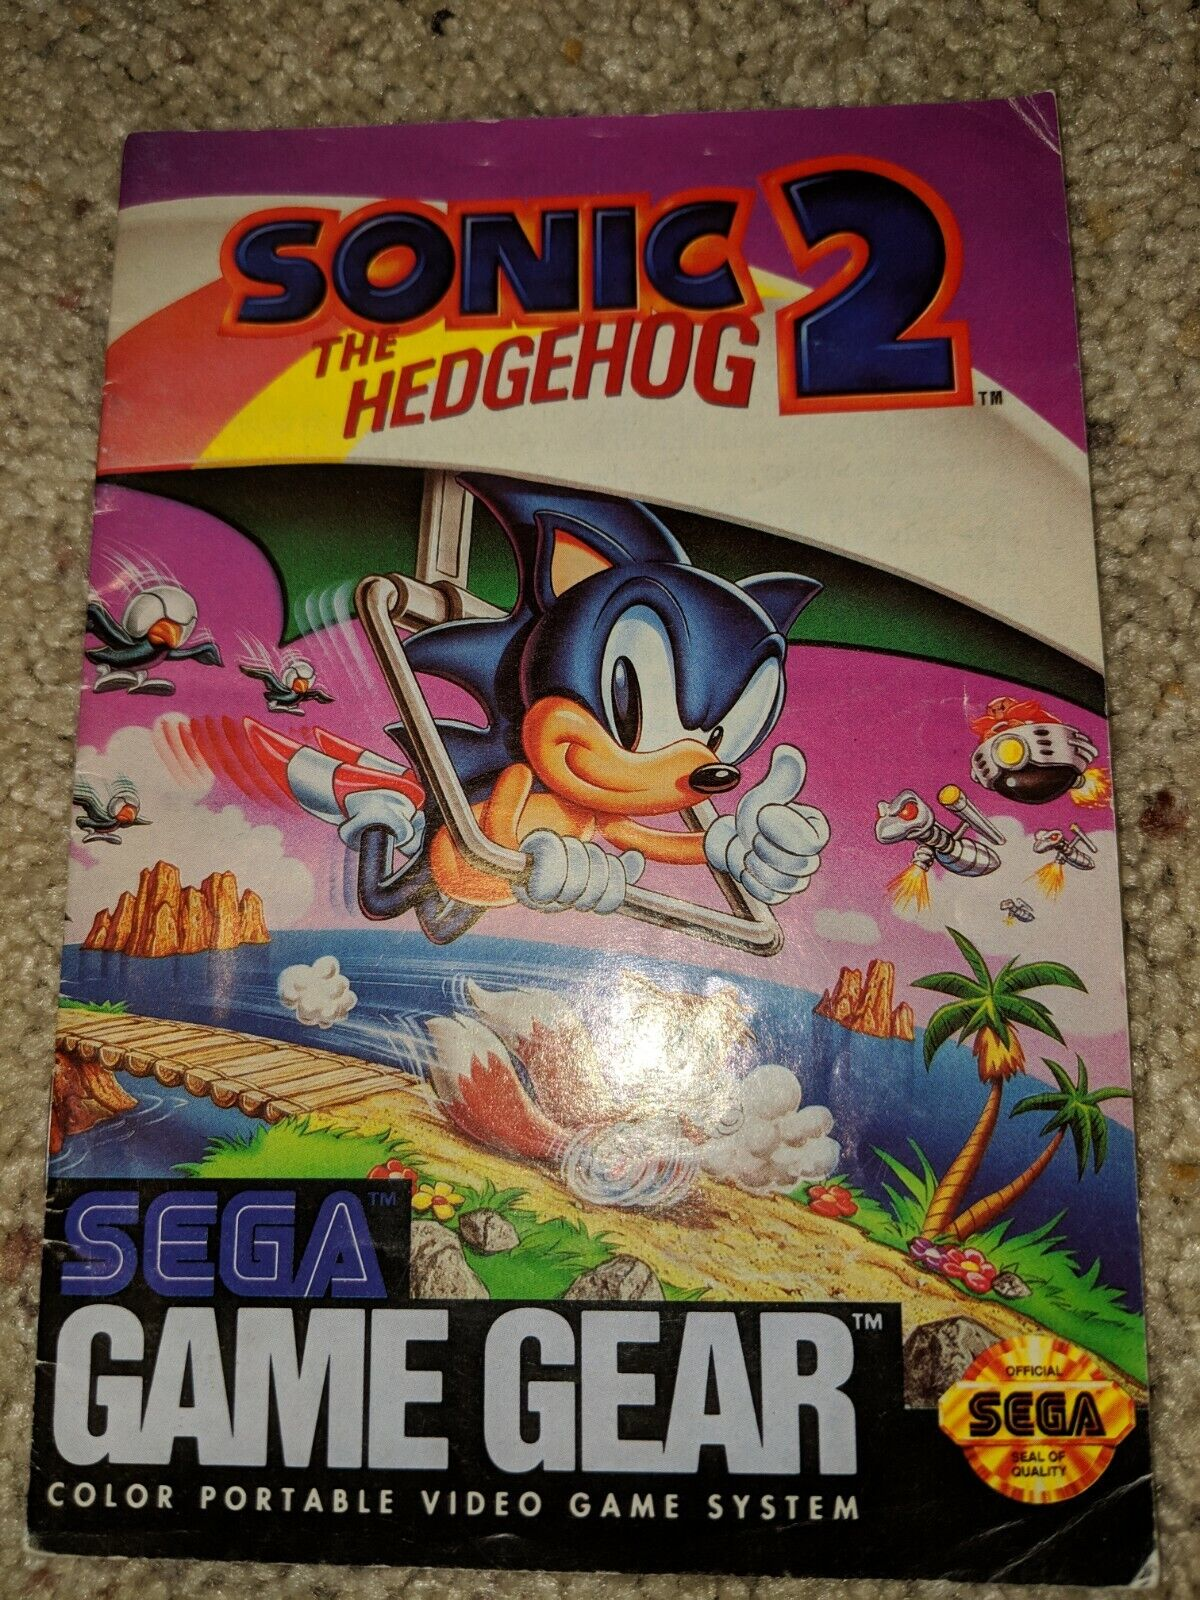 Sega Game Gear Sonic The Hedgehog 2 Video Game Manual - $0.99